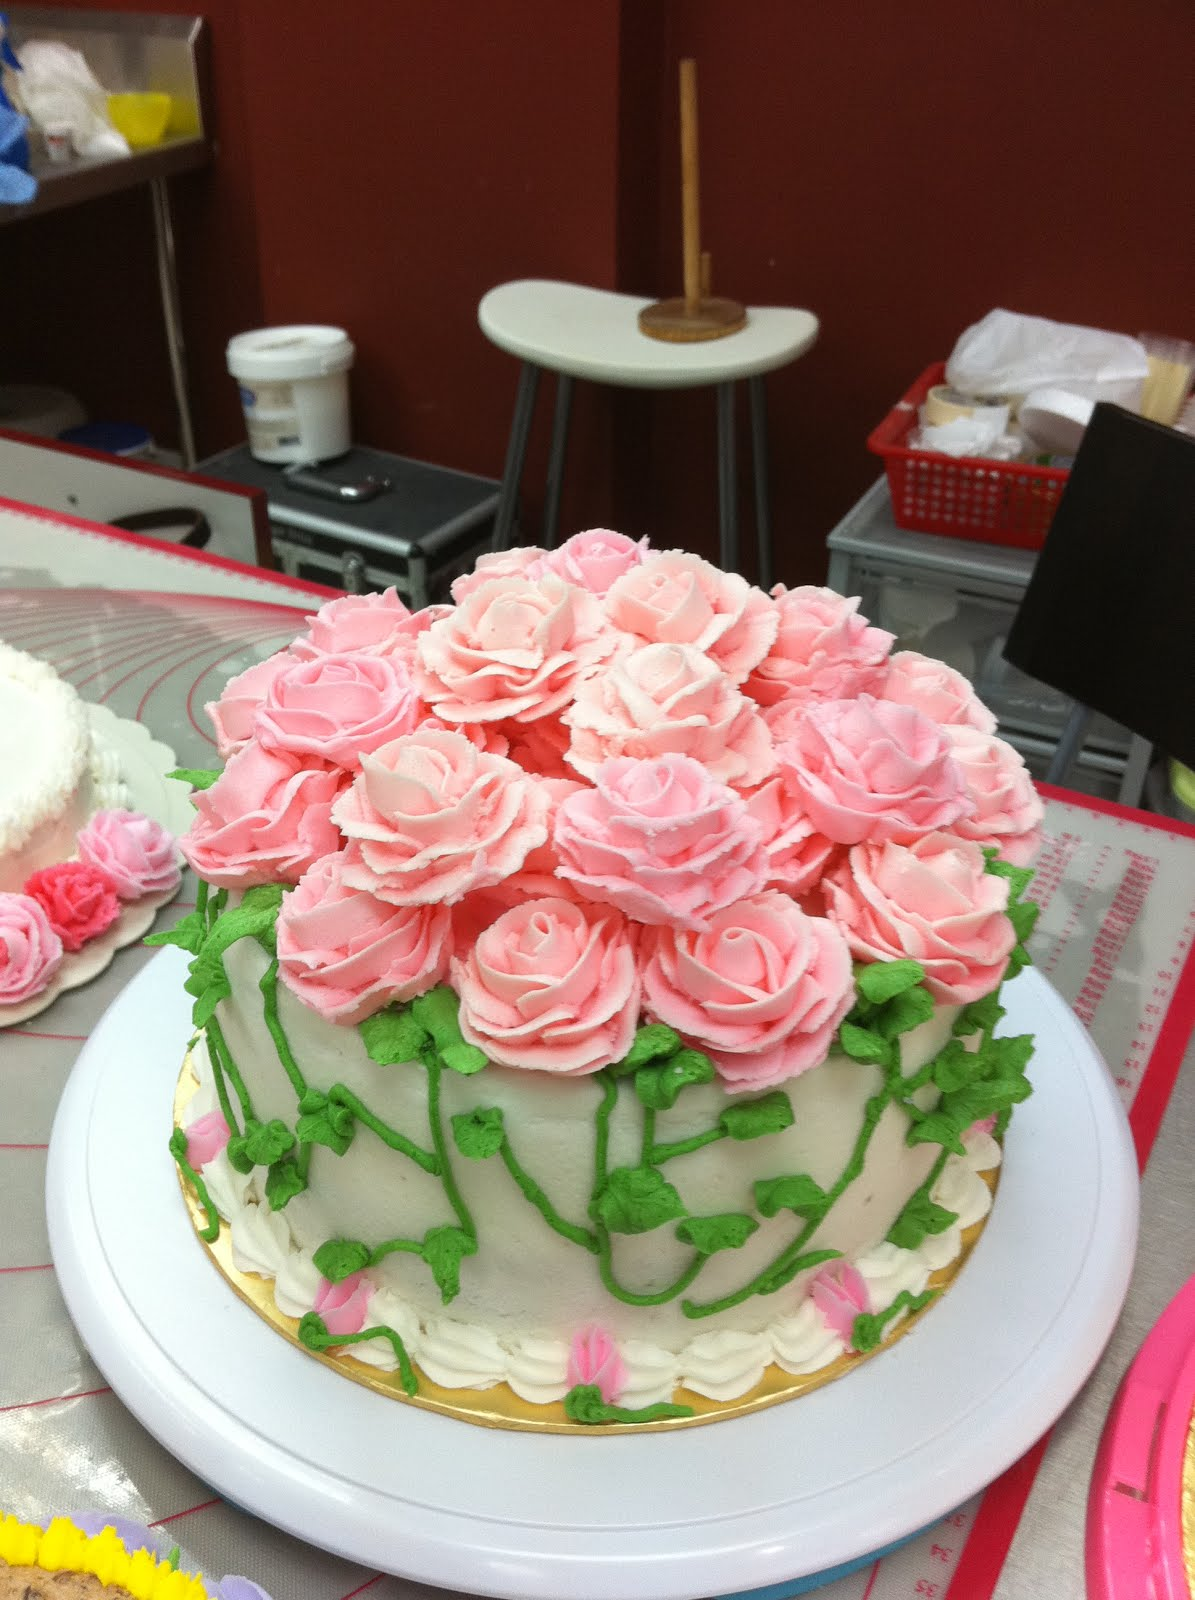 Home May'de Cakes: Wilton Cake Decorating Course 1 ...